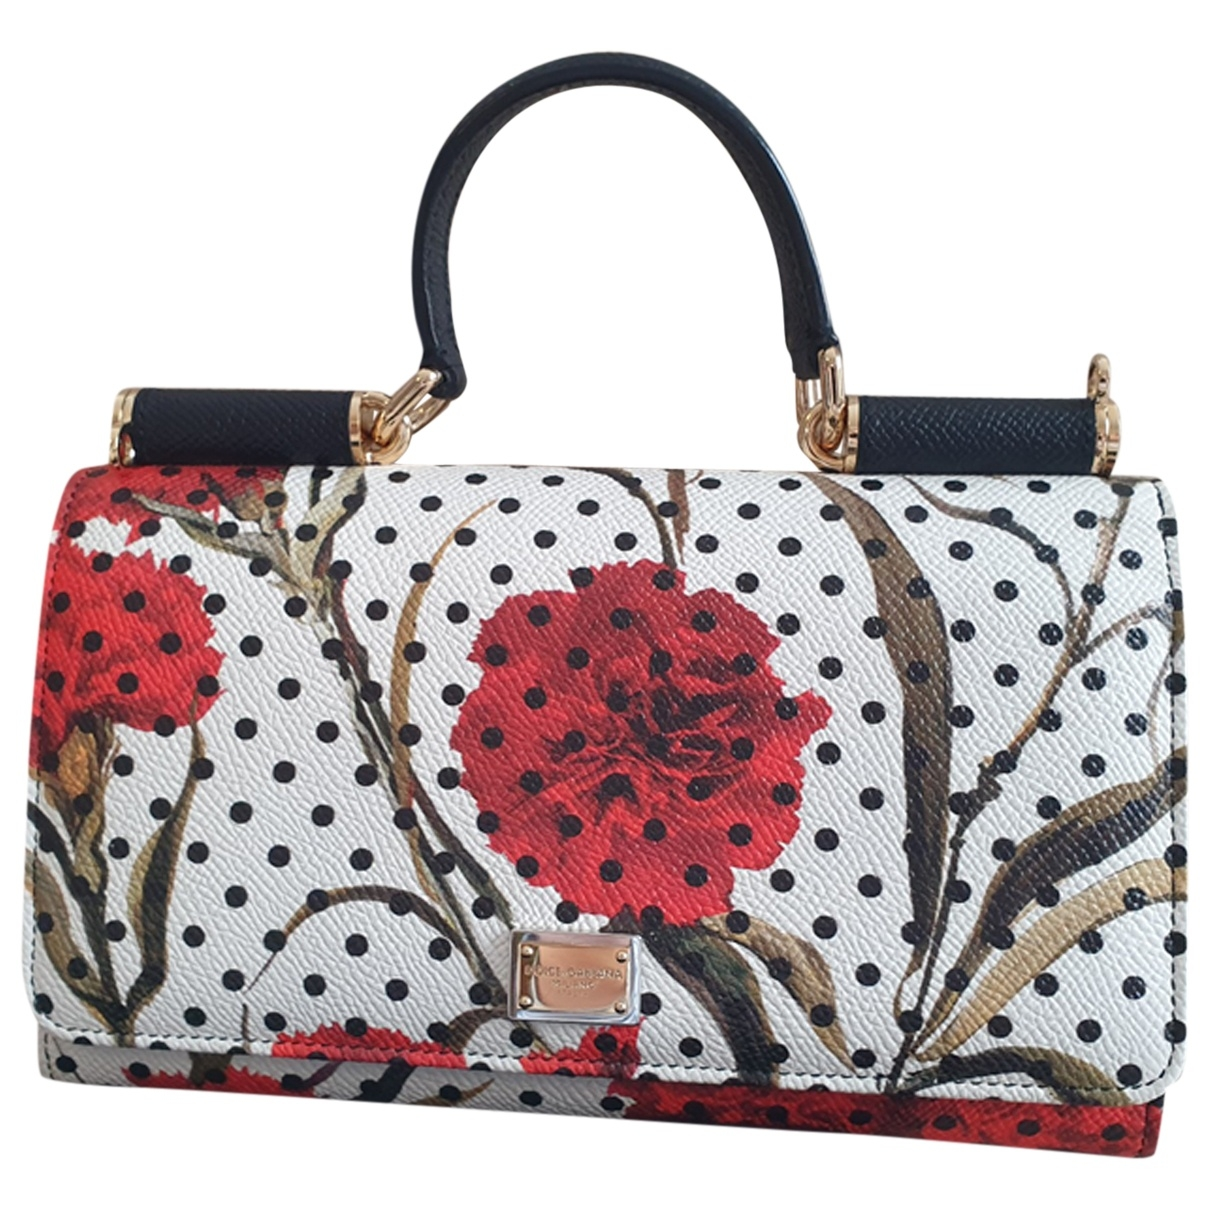 Dolce & Gabbana Sicily Multicolour Leather Clutch bag for Women \N